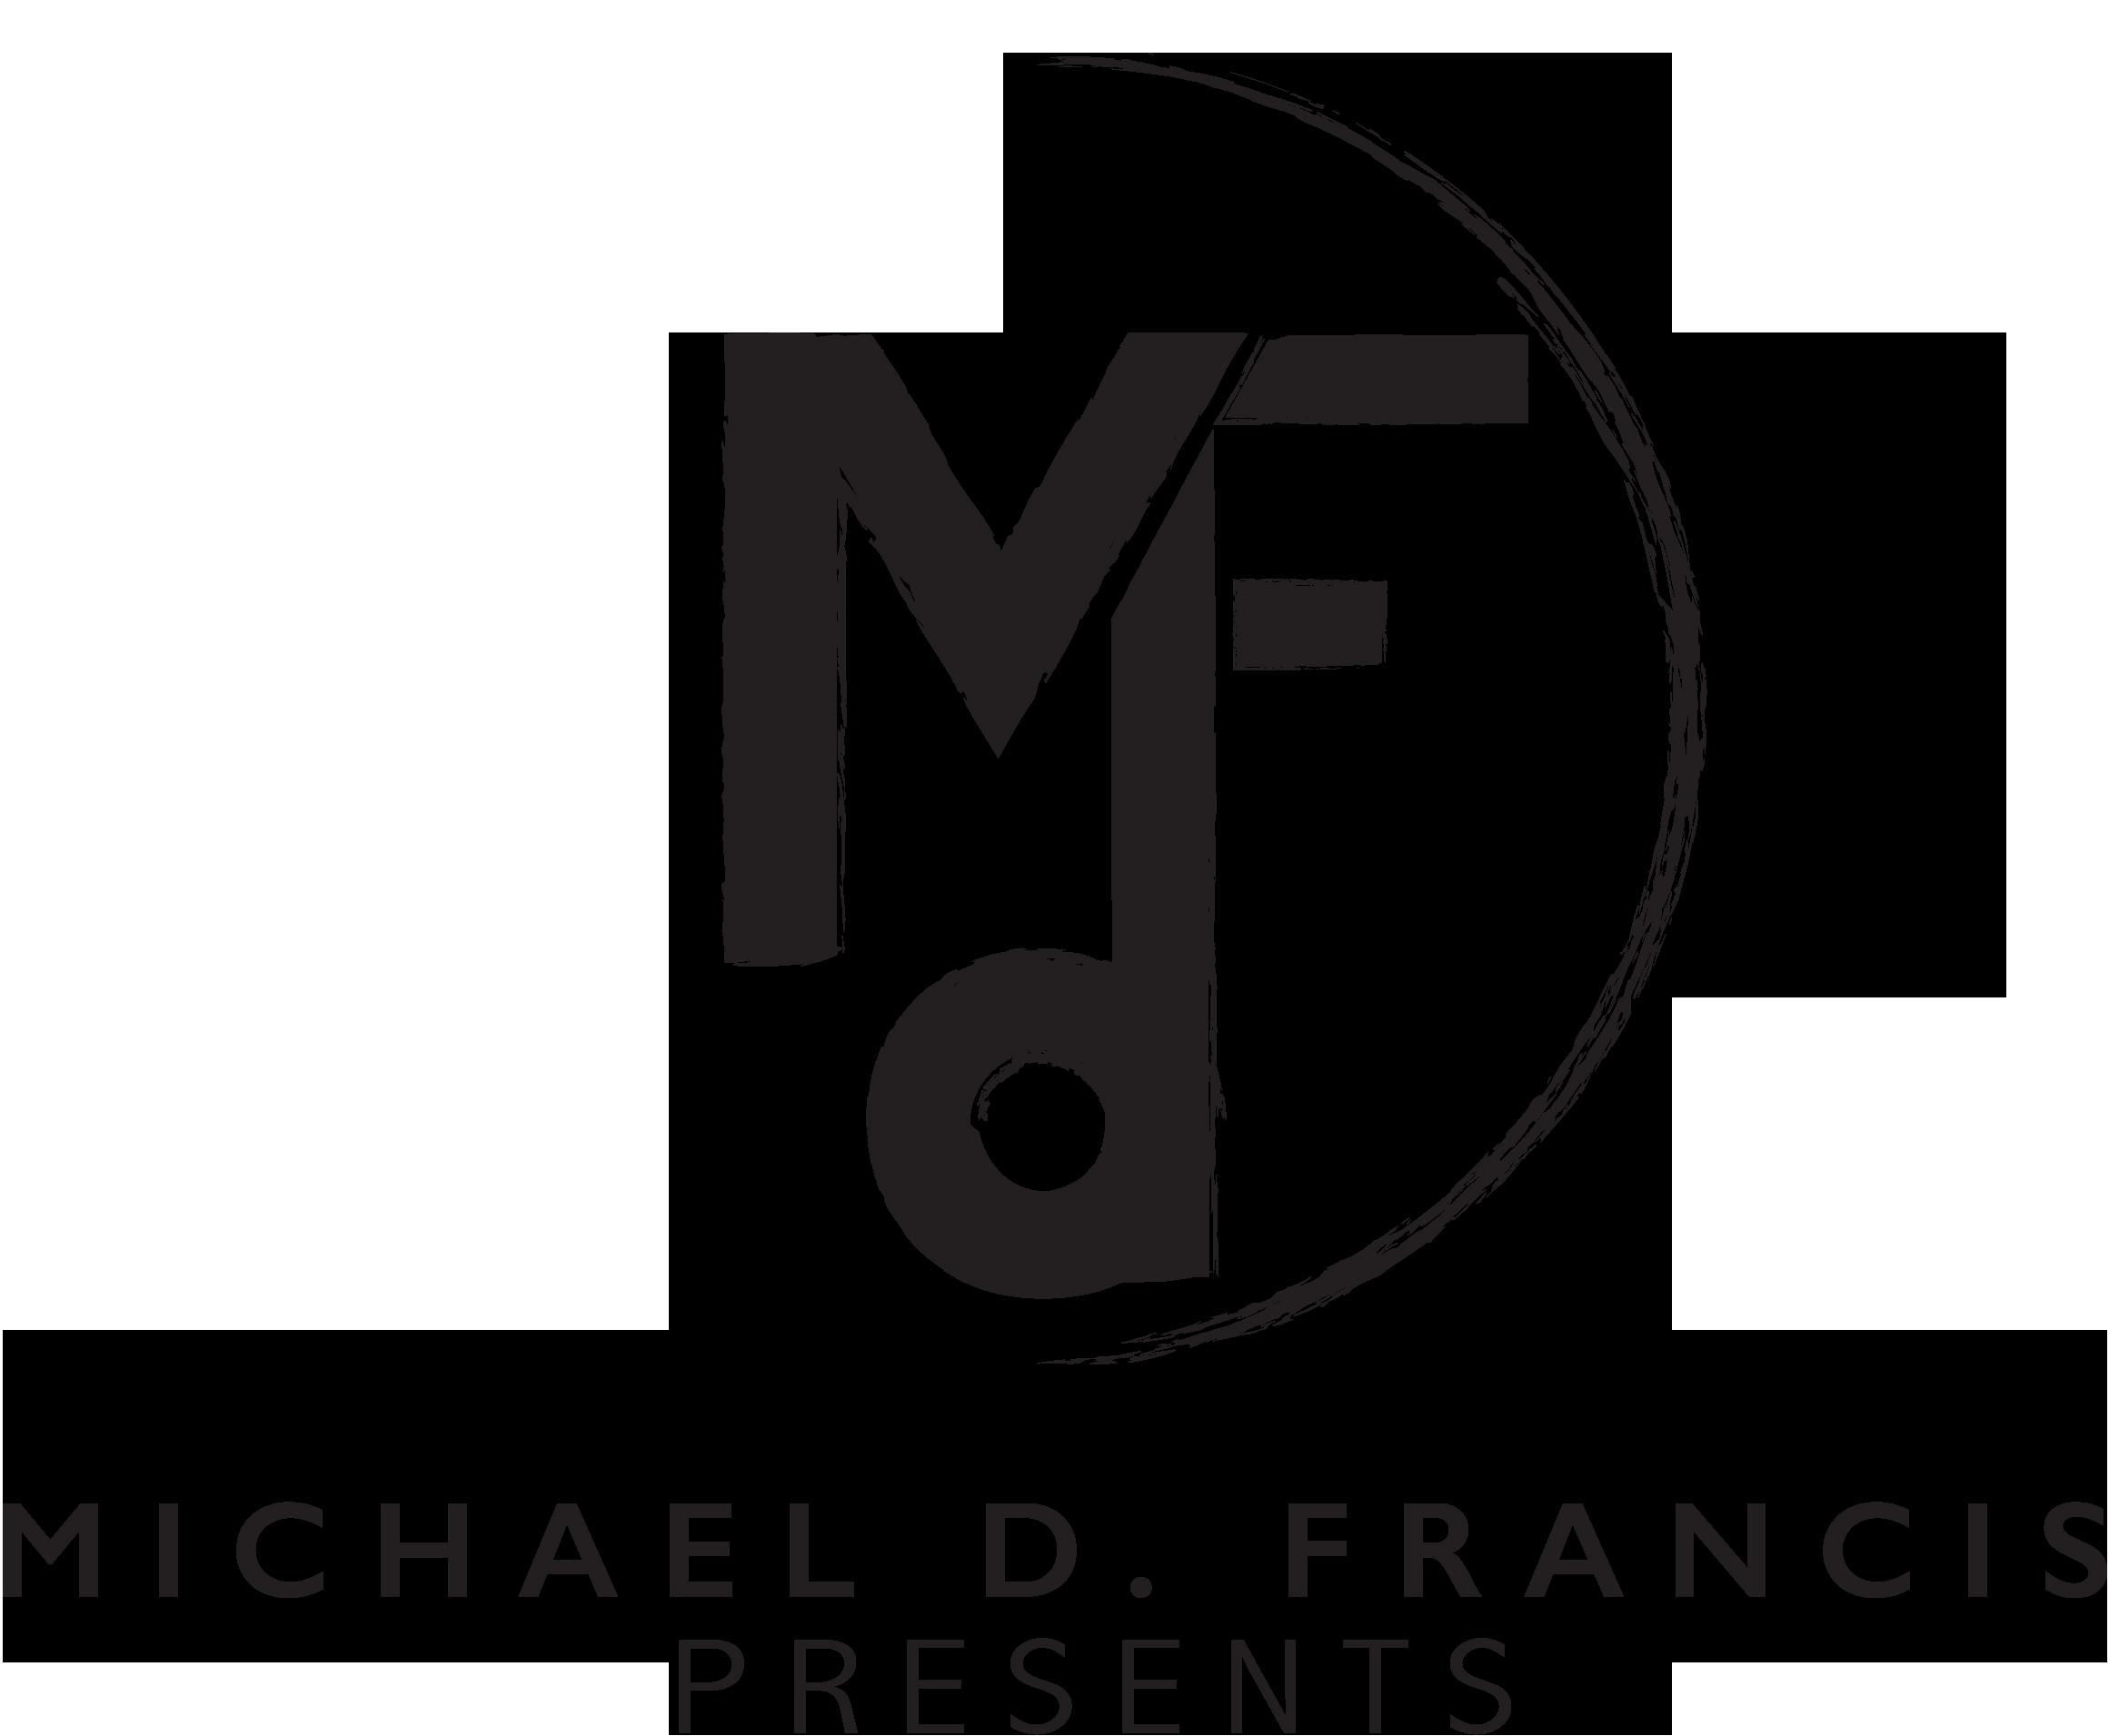 MichaelDFrancisPresents_OptionB_allBlack.png